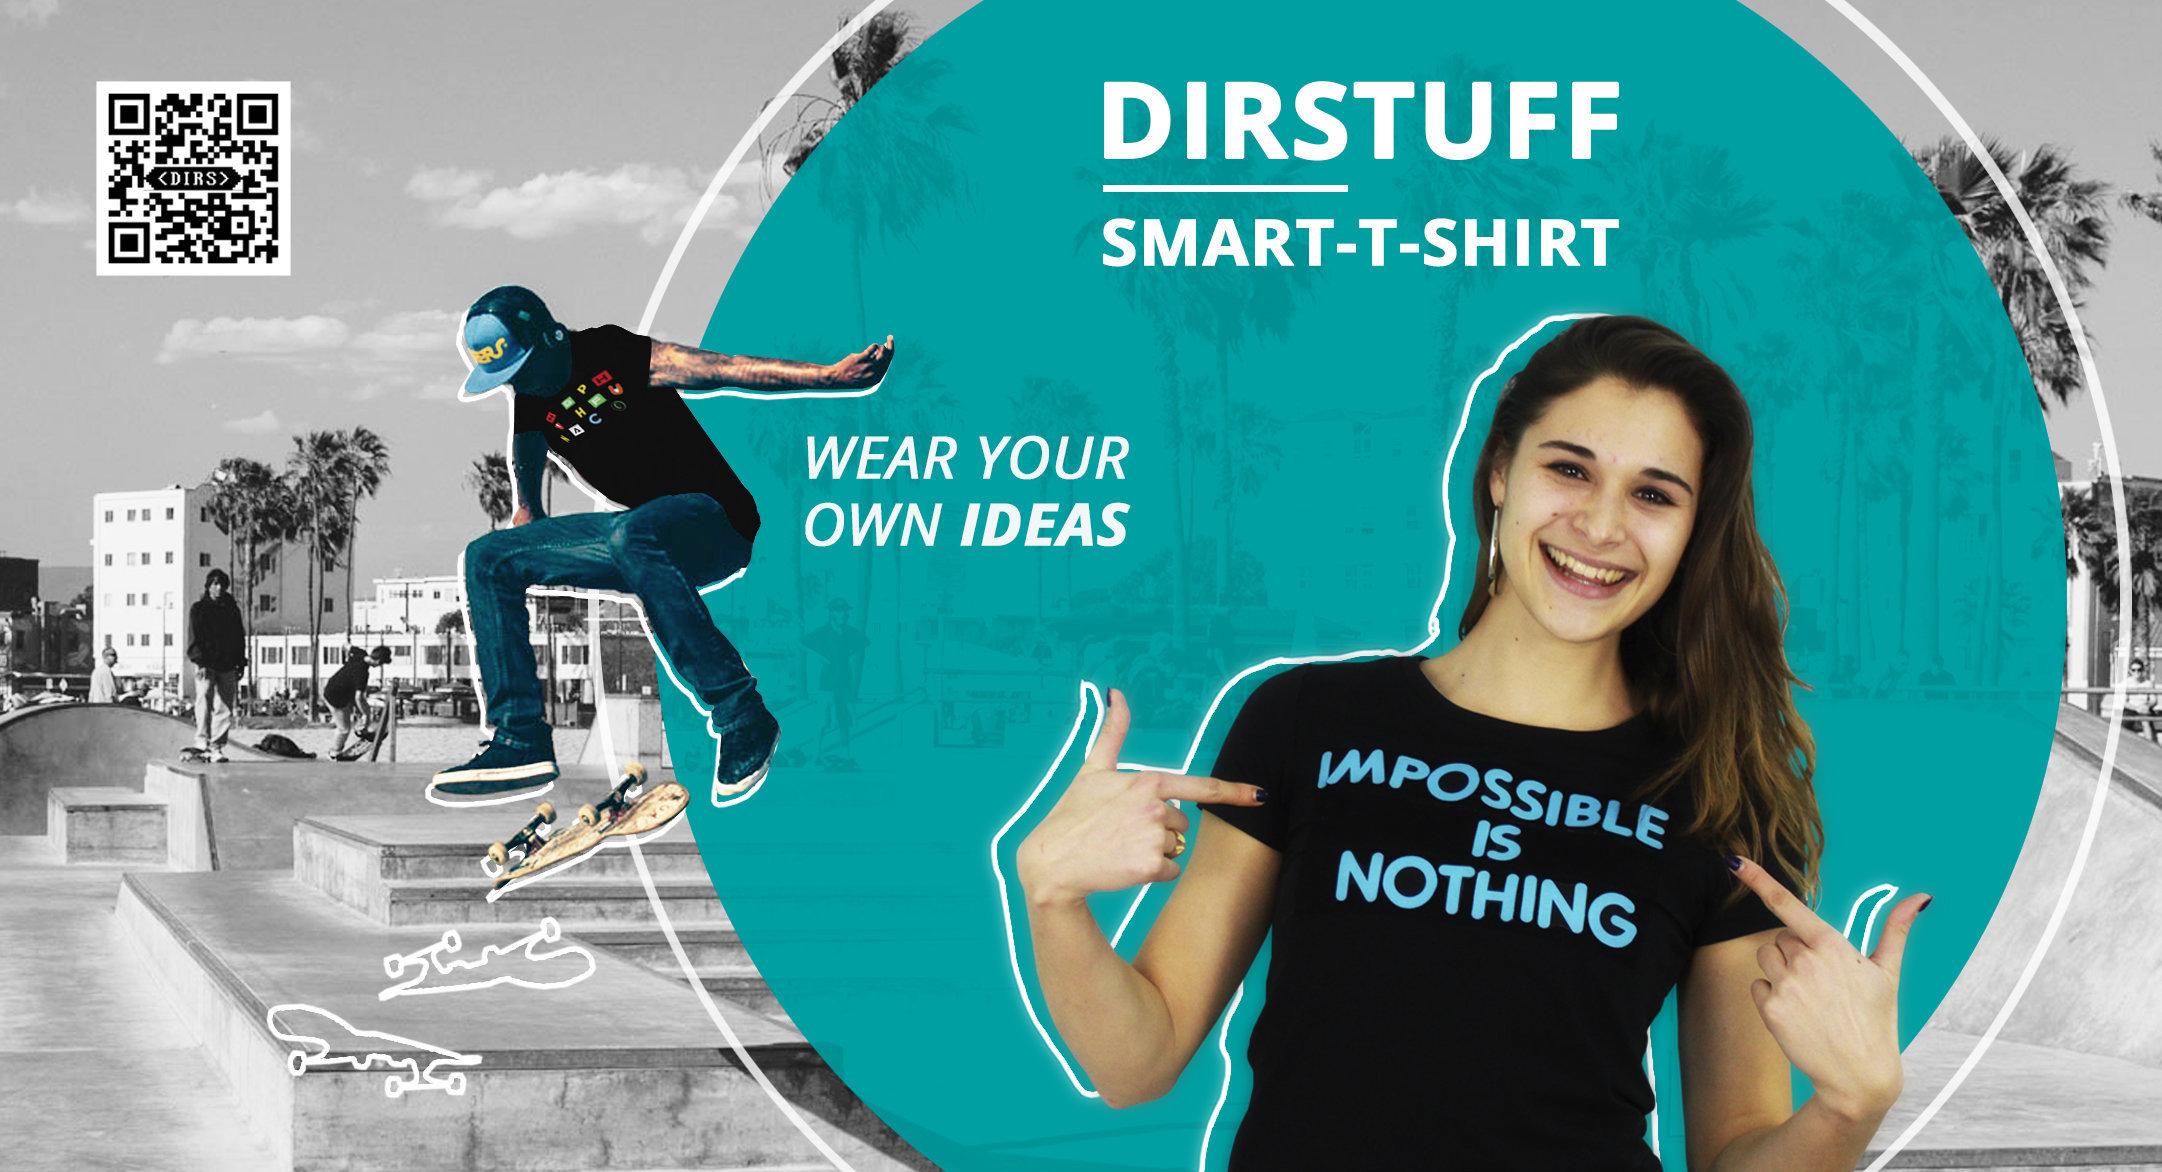 Dirstuff, empresa creada por un joven cubano, Juan Pablo Fung Collazo